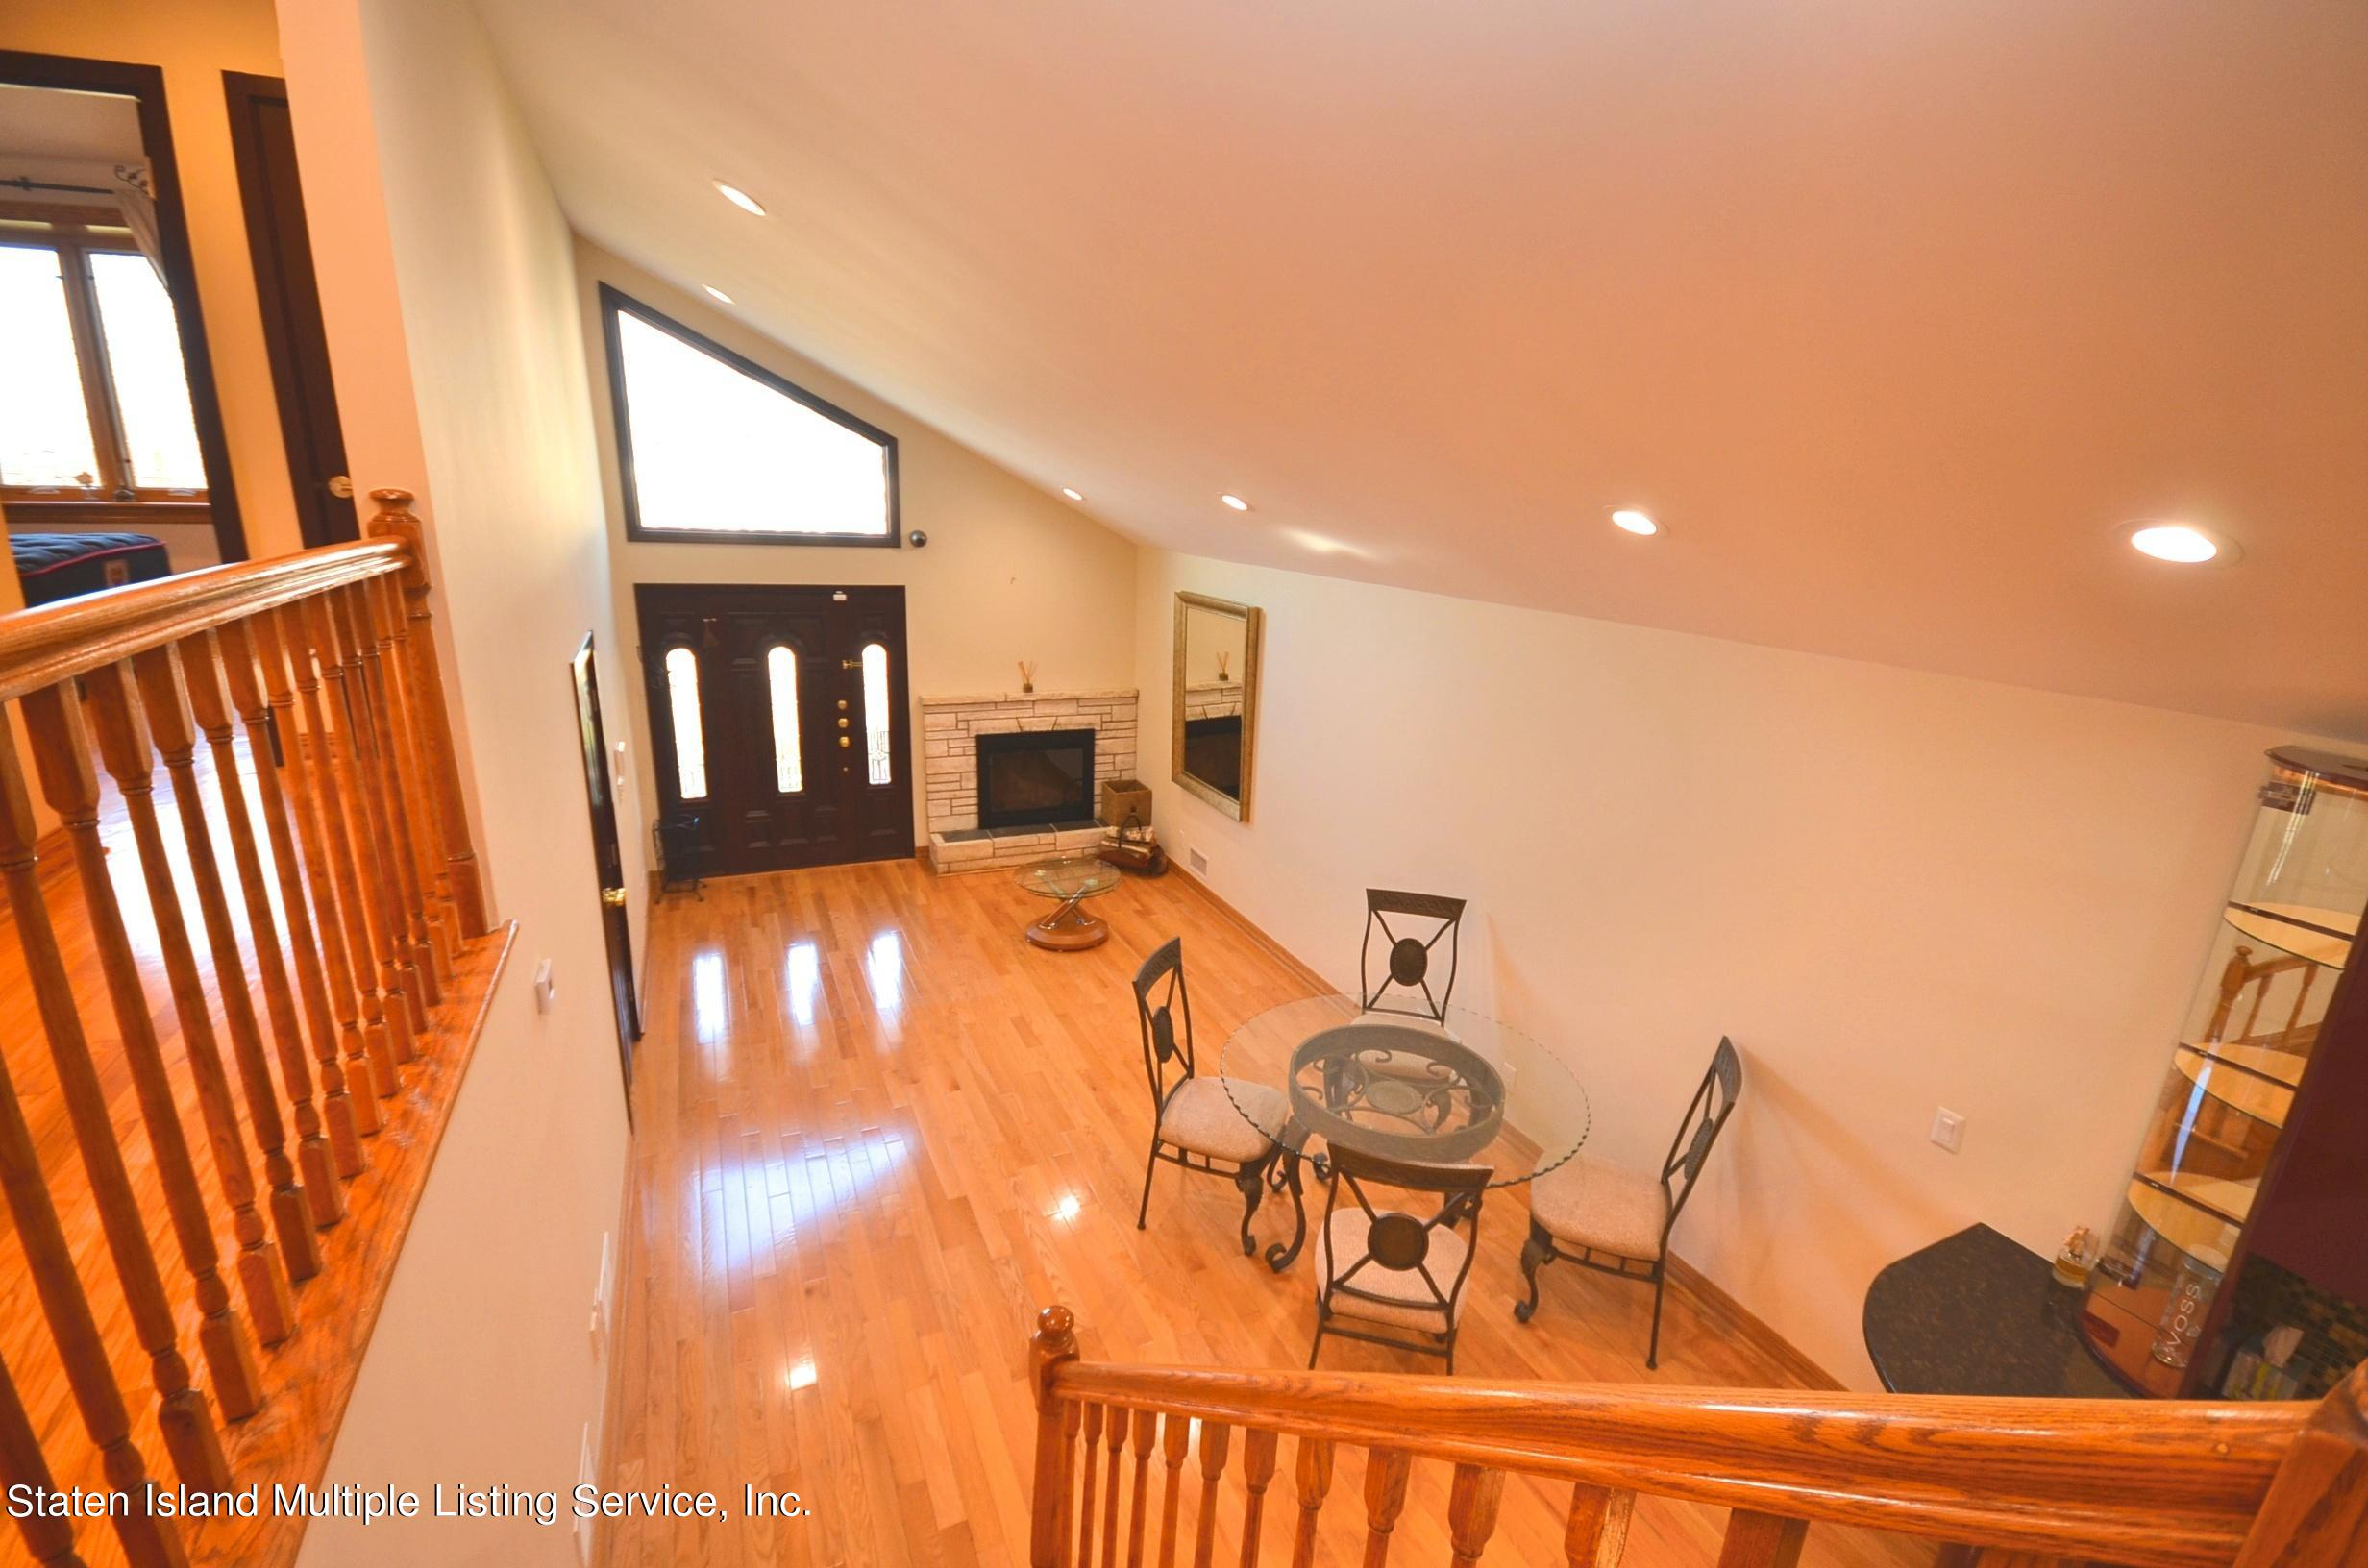 Single Family - Detached 48 Ocean Terrace  Staten Island, NY 10314, MLS-1142240-9